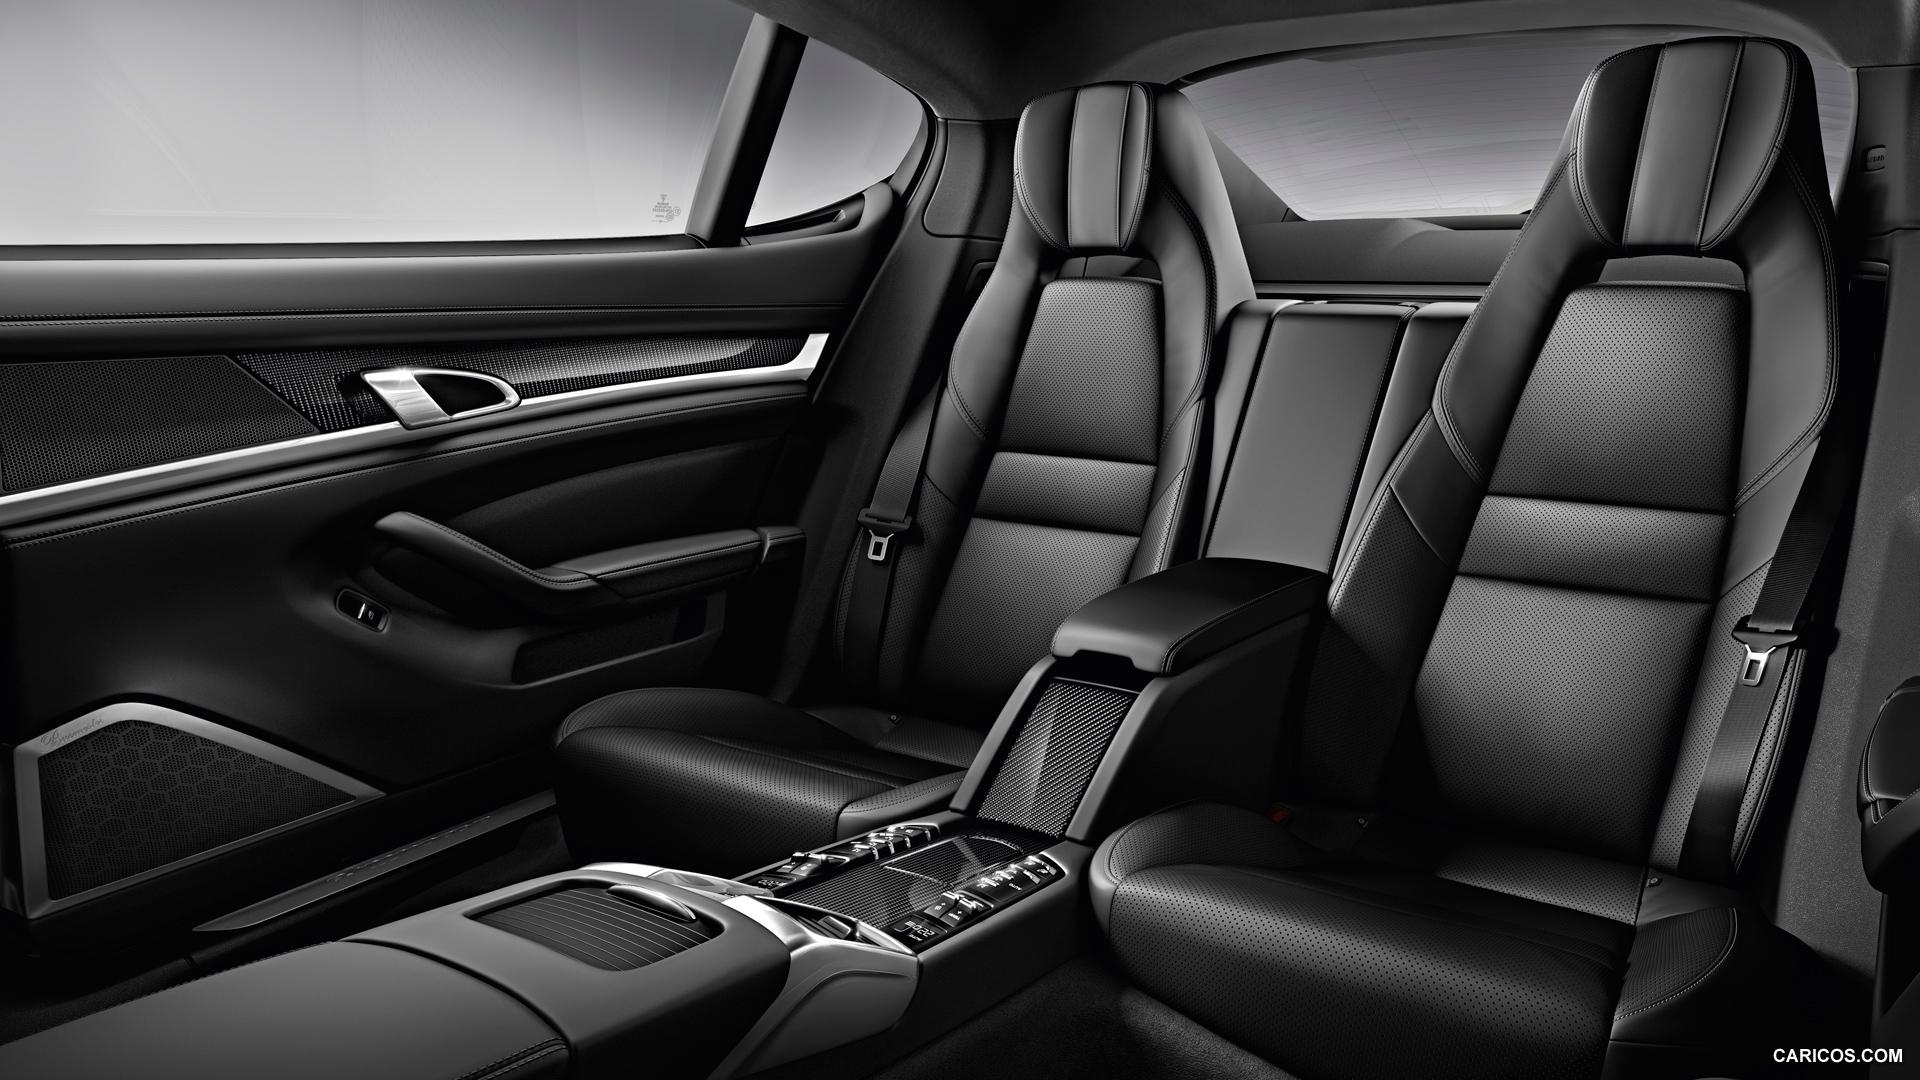 Porsche Panamera S Luxury Car Rental Miami Inside Prime Luxury